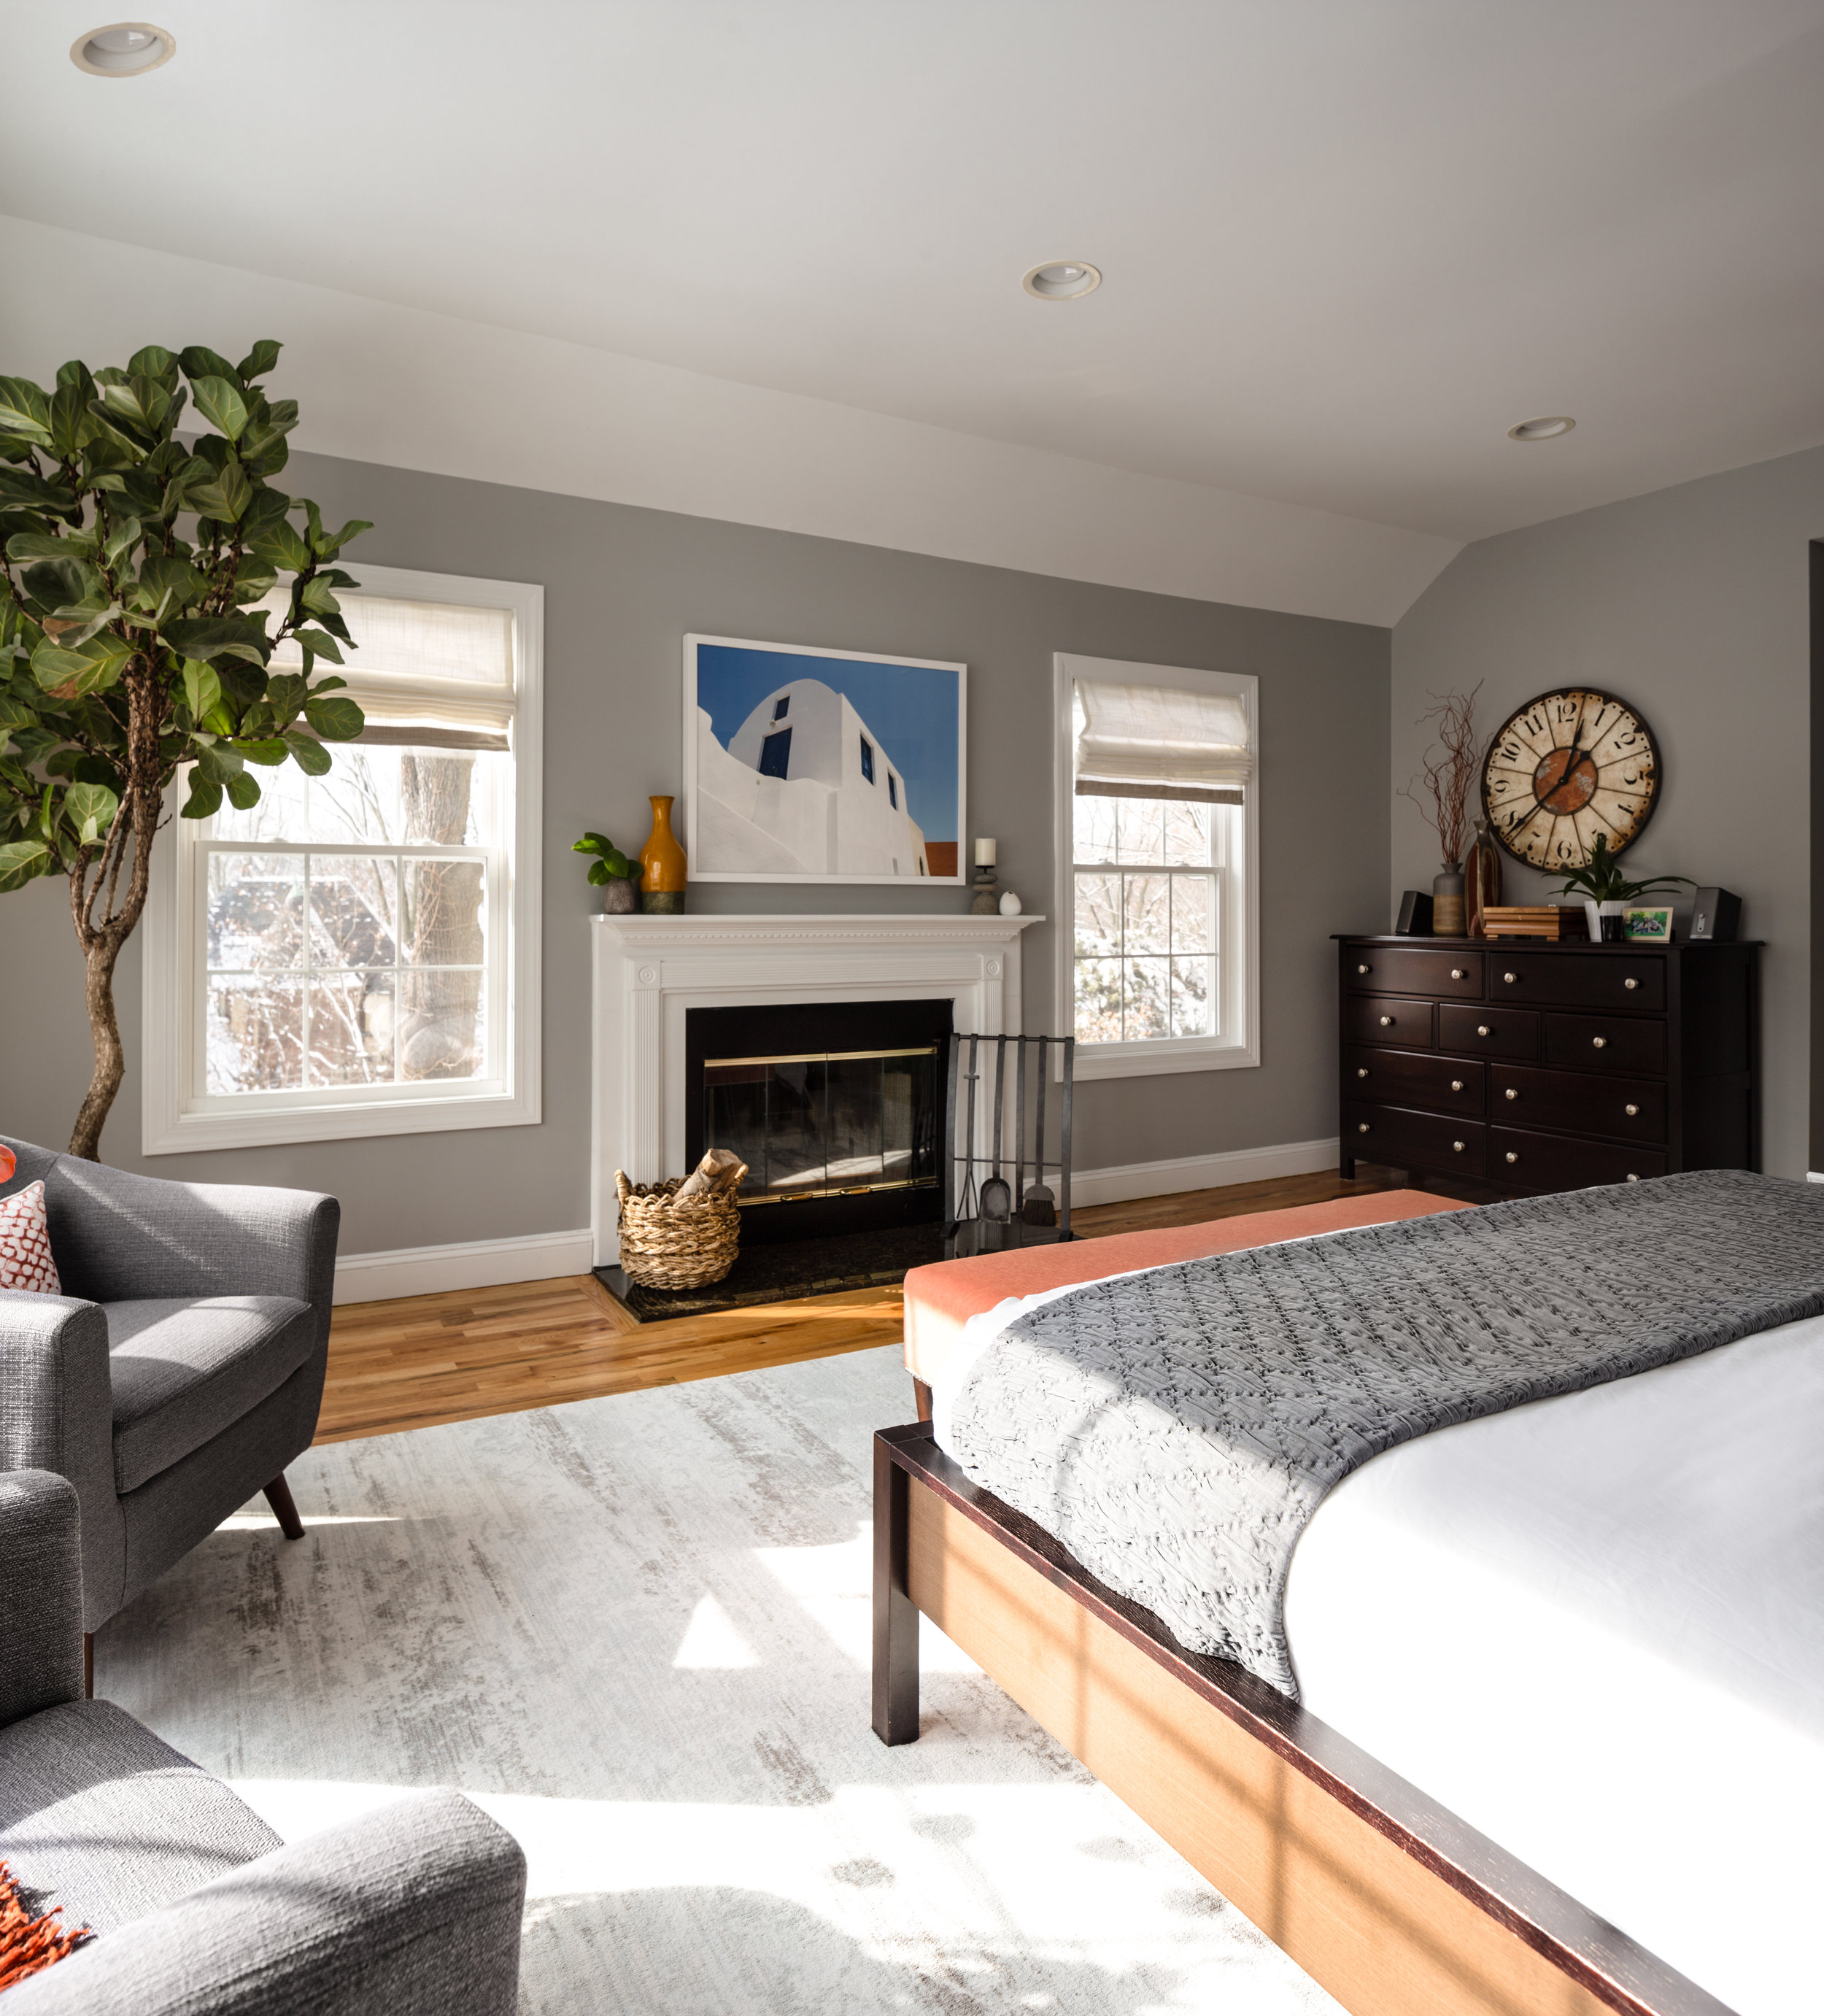 Interiors Photography - Bedroom Area